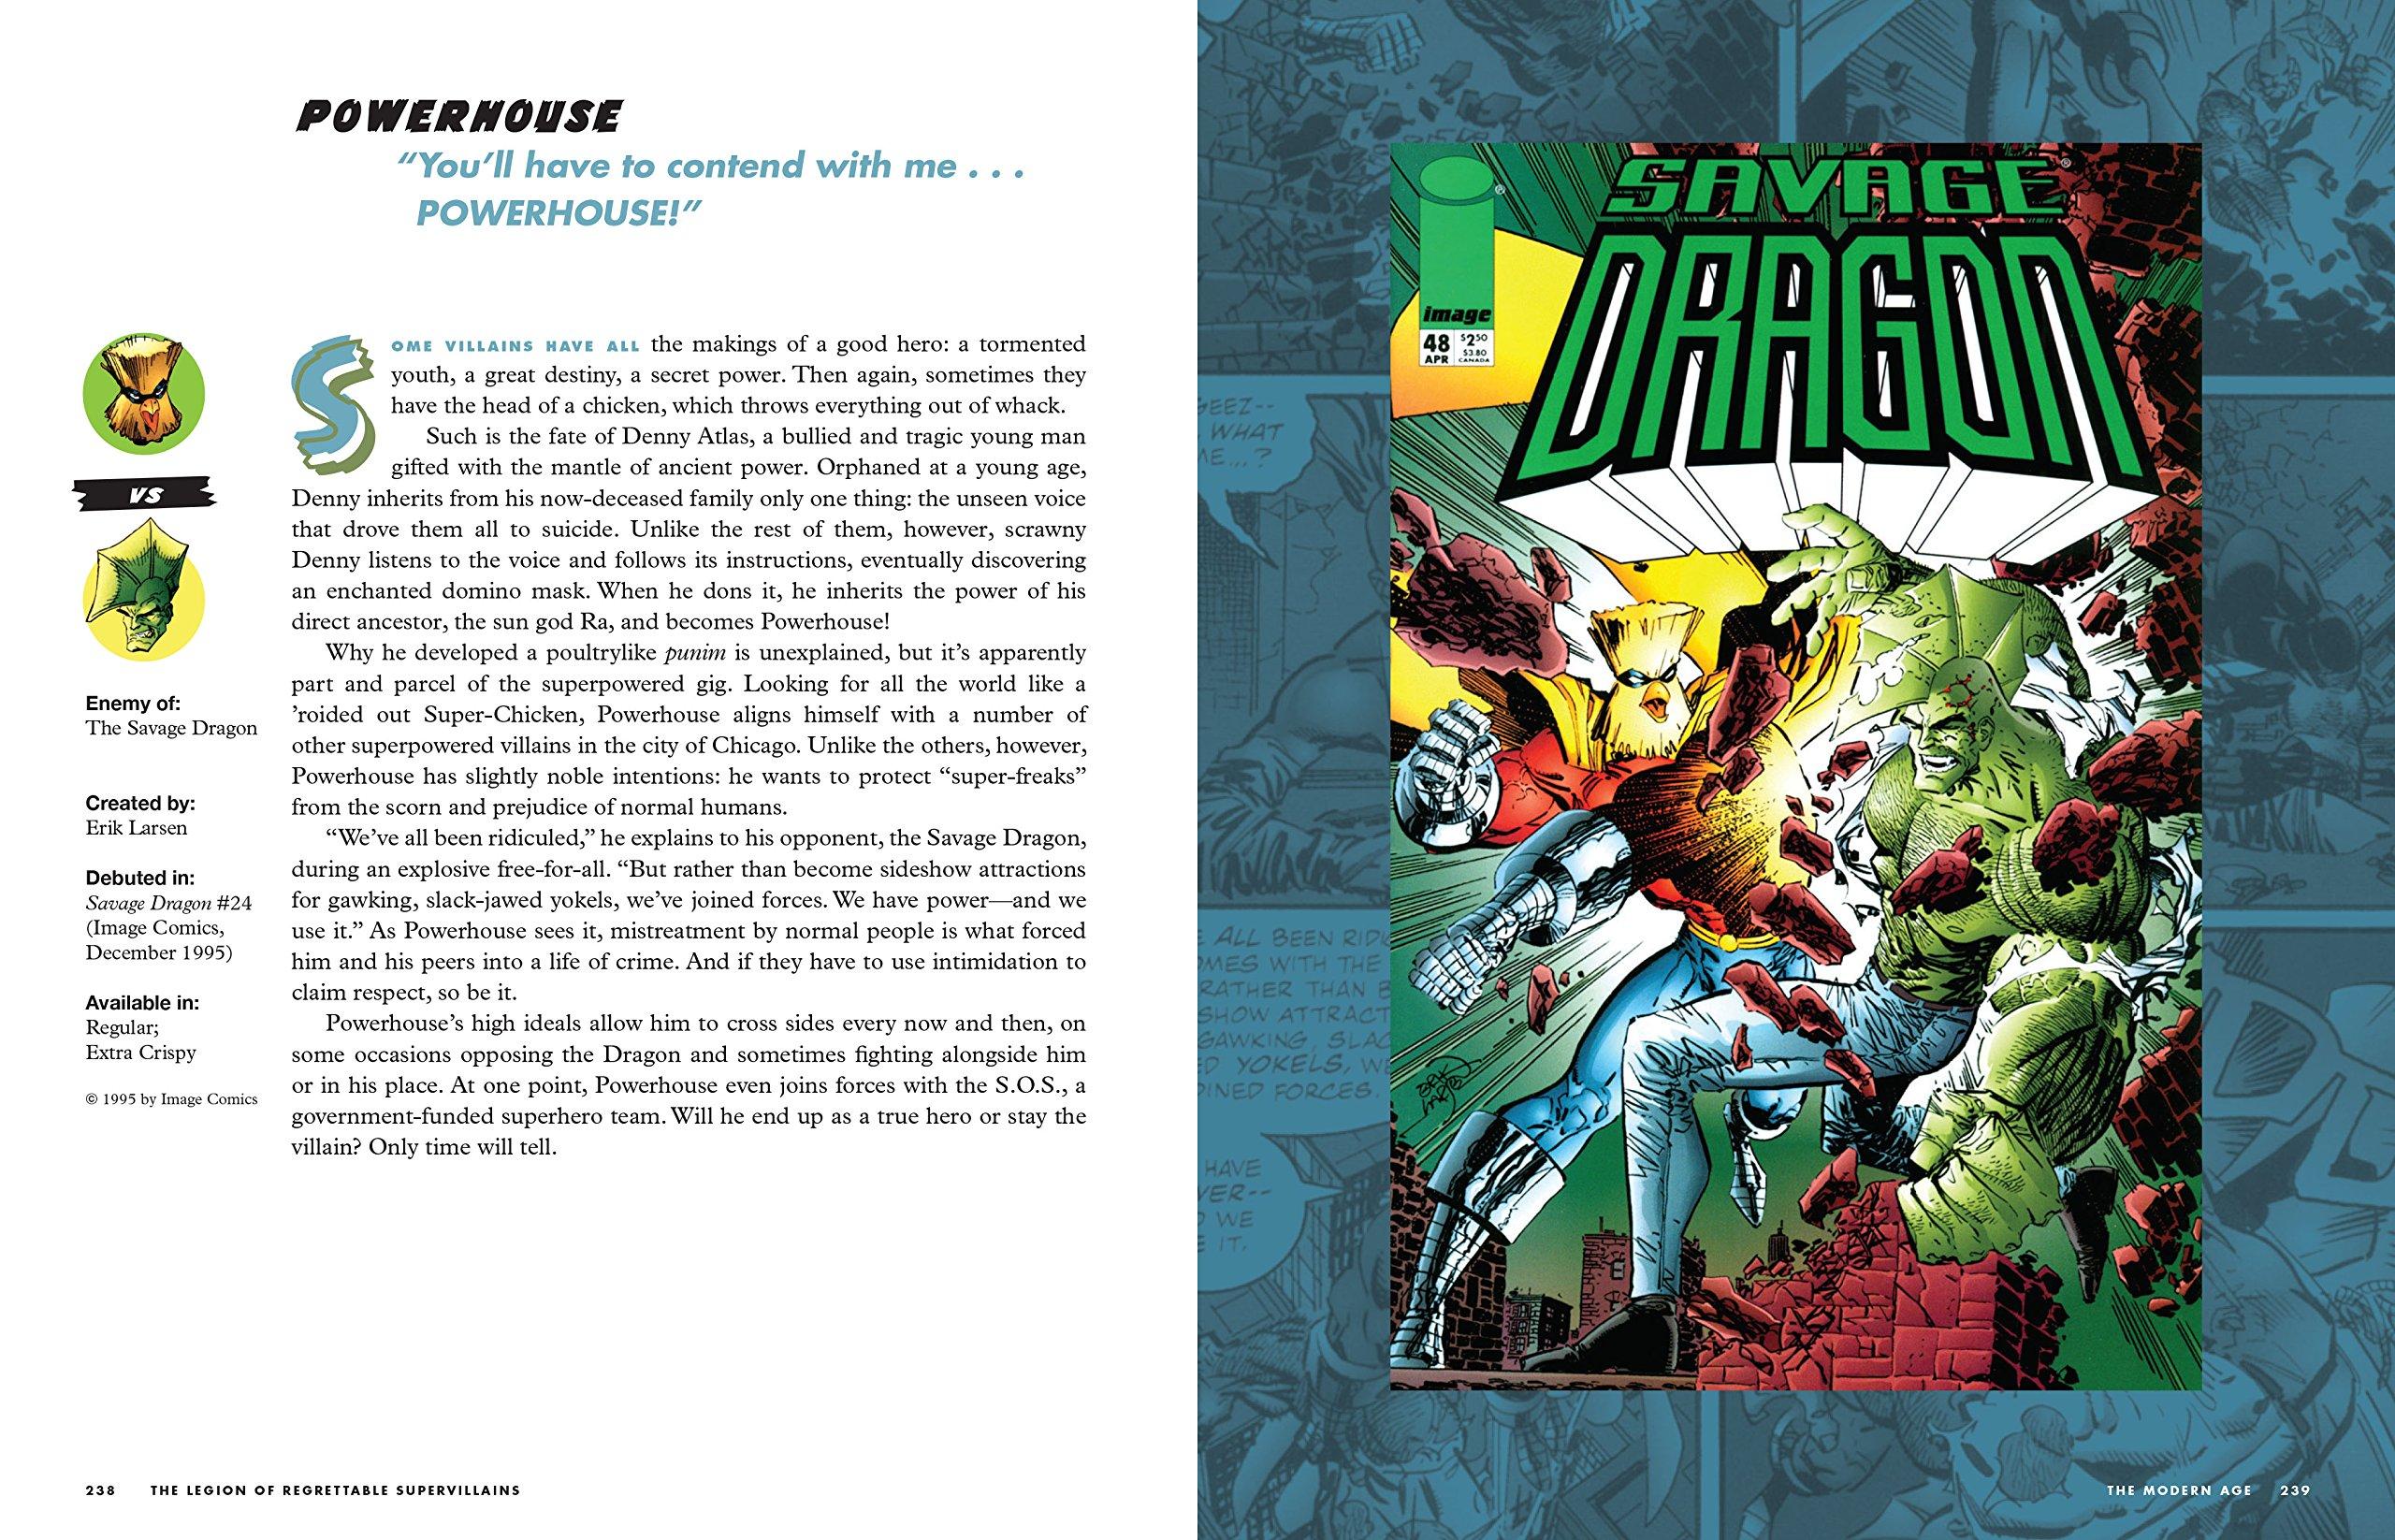 The Legion Of Regrettable Supervillains: Oddball Criminals Fromic Book  History: Amazon: Jon Morris: 9781594749322: Books